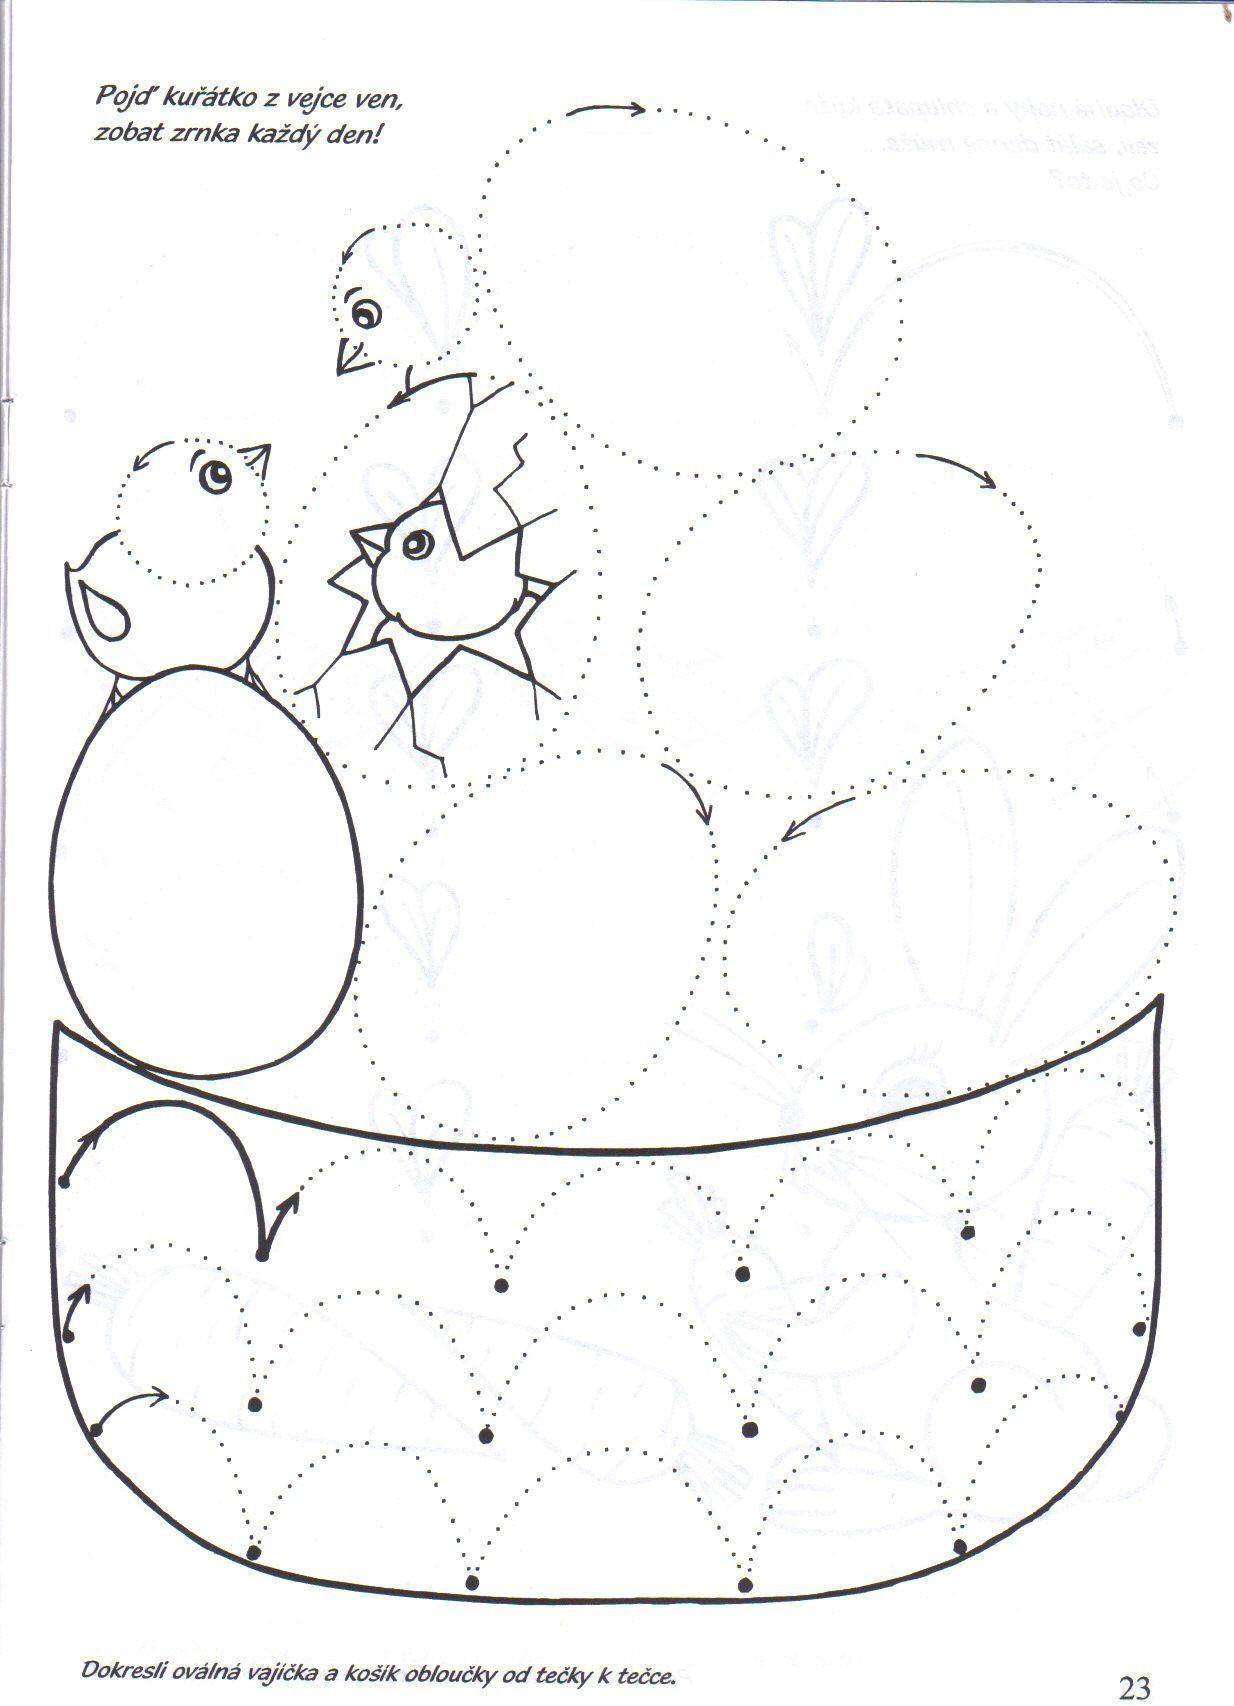 Ostereier Malvorlagen Ausdrucken Lovely Malvorlagen Minion Elegant